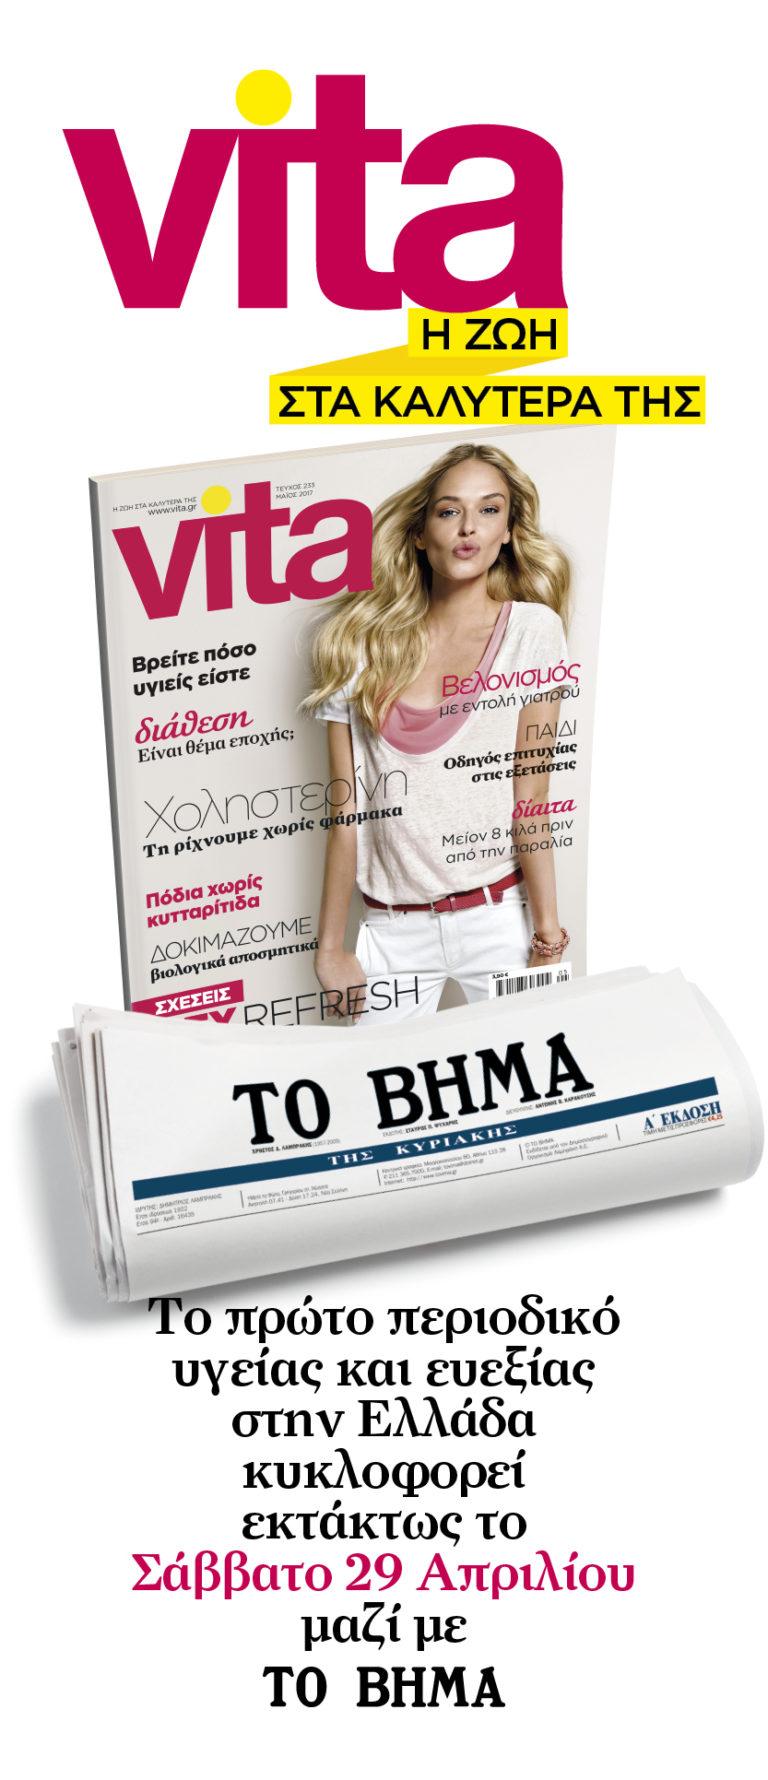 Vita Μαϊου233 | vita.gr